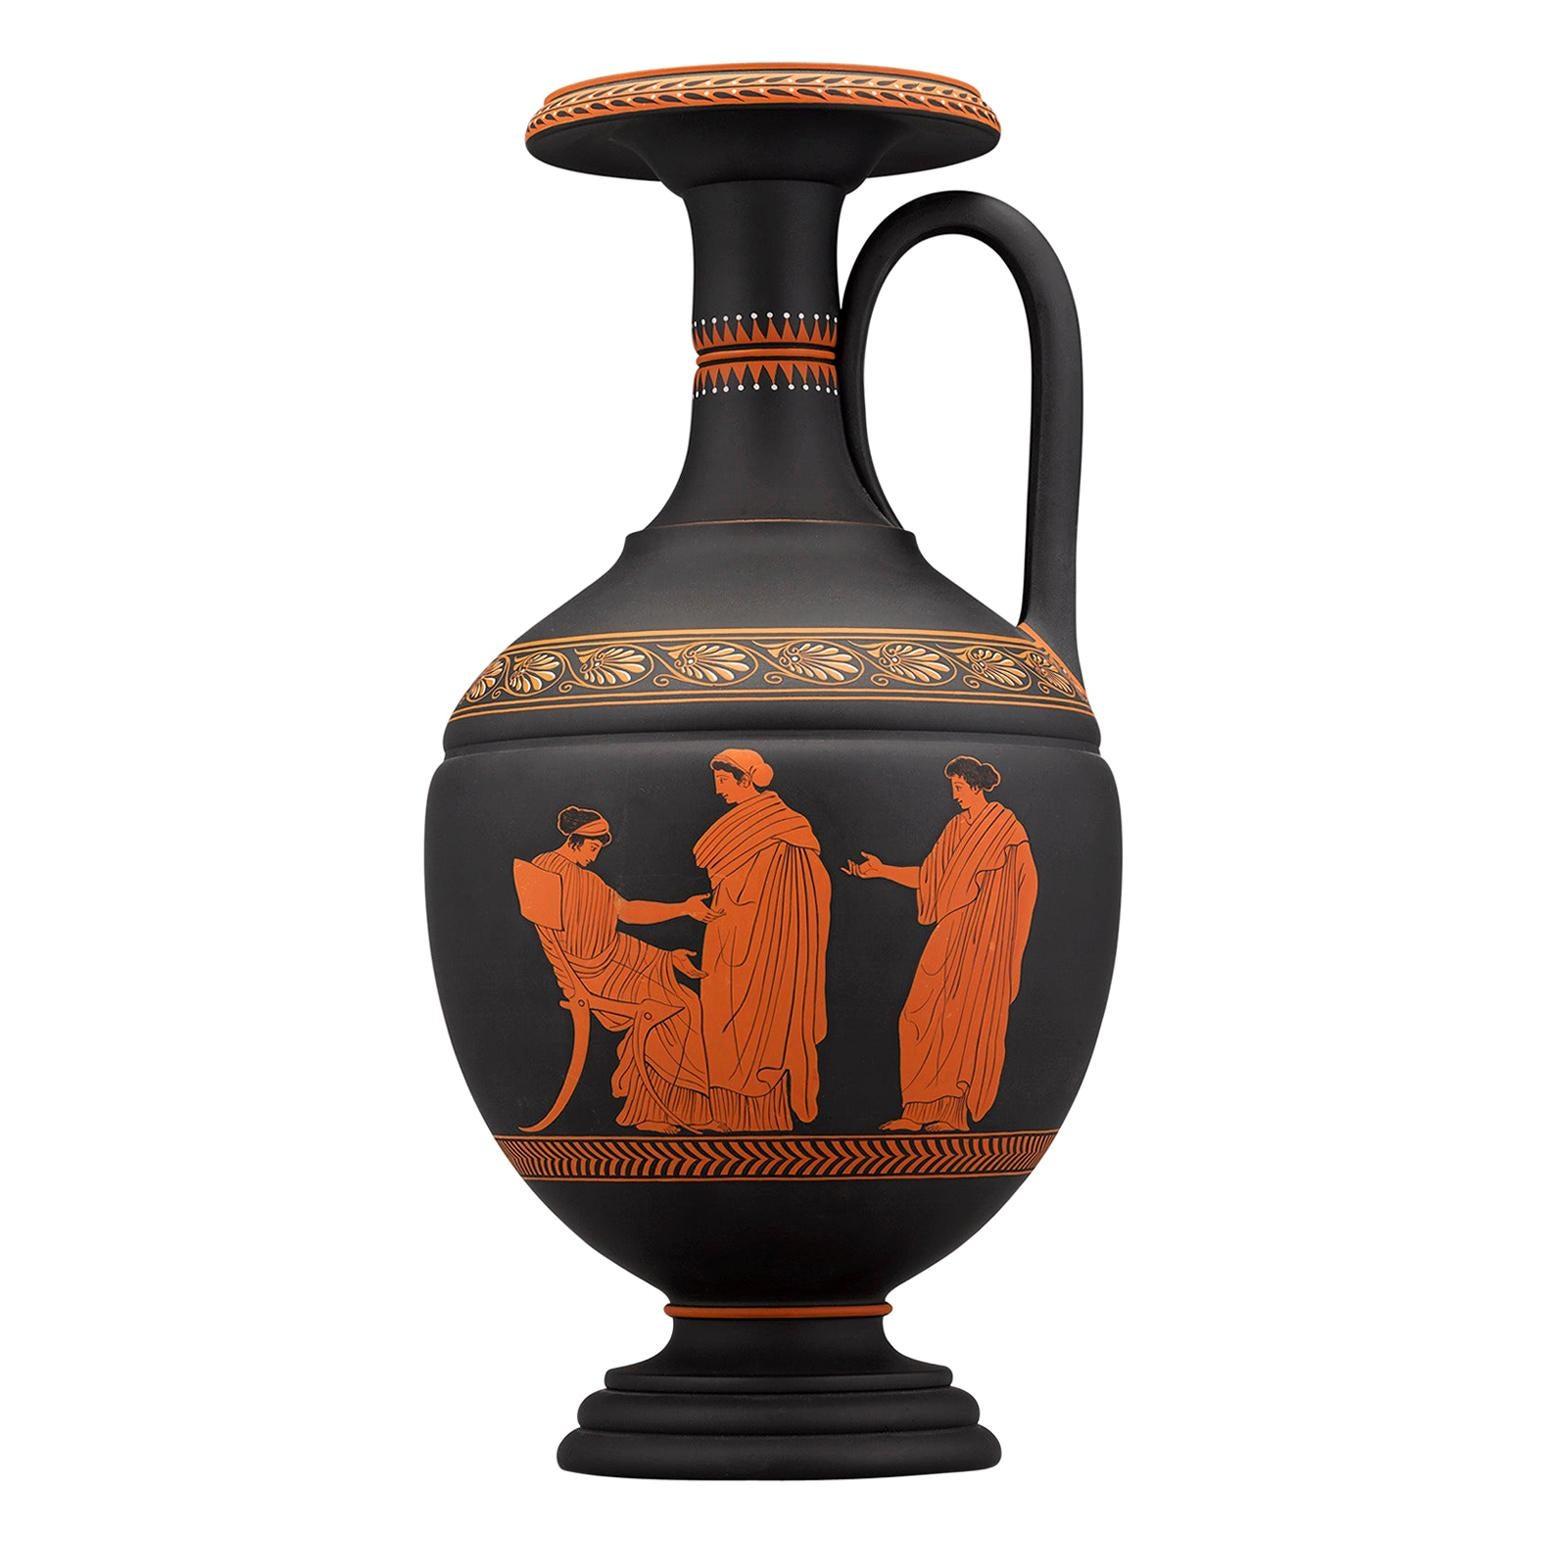 Wedgwood Neoclassical Black Basalt Encaustic Enamel Amphora